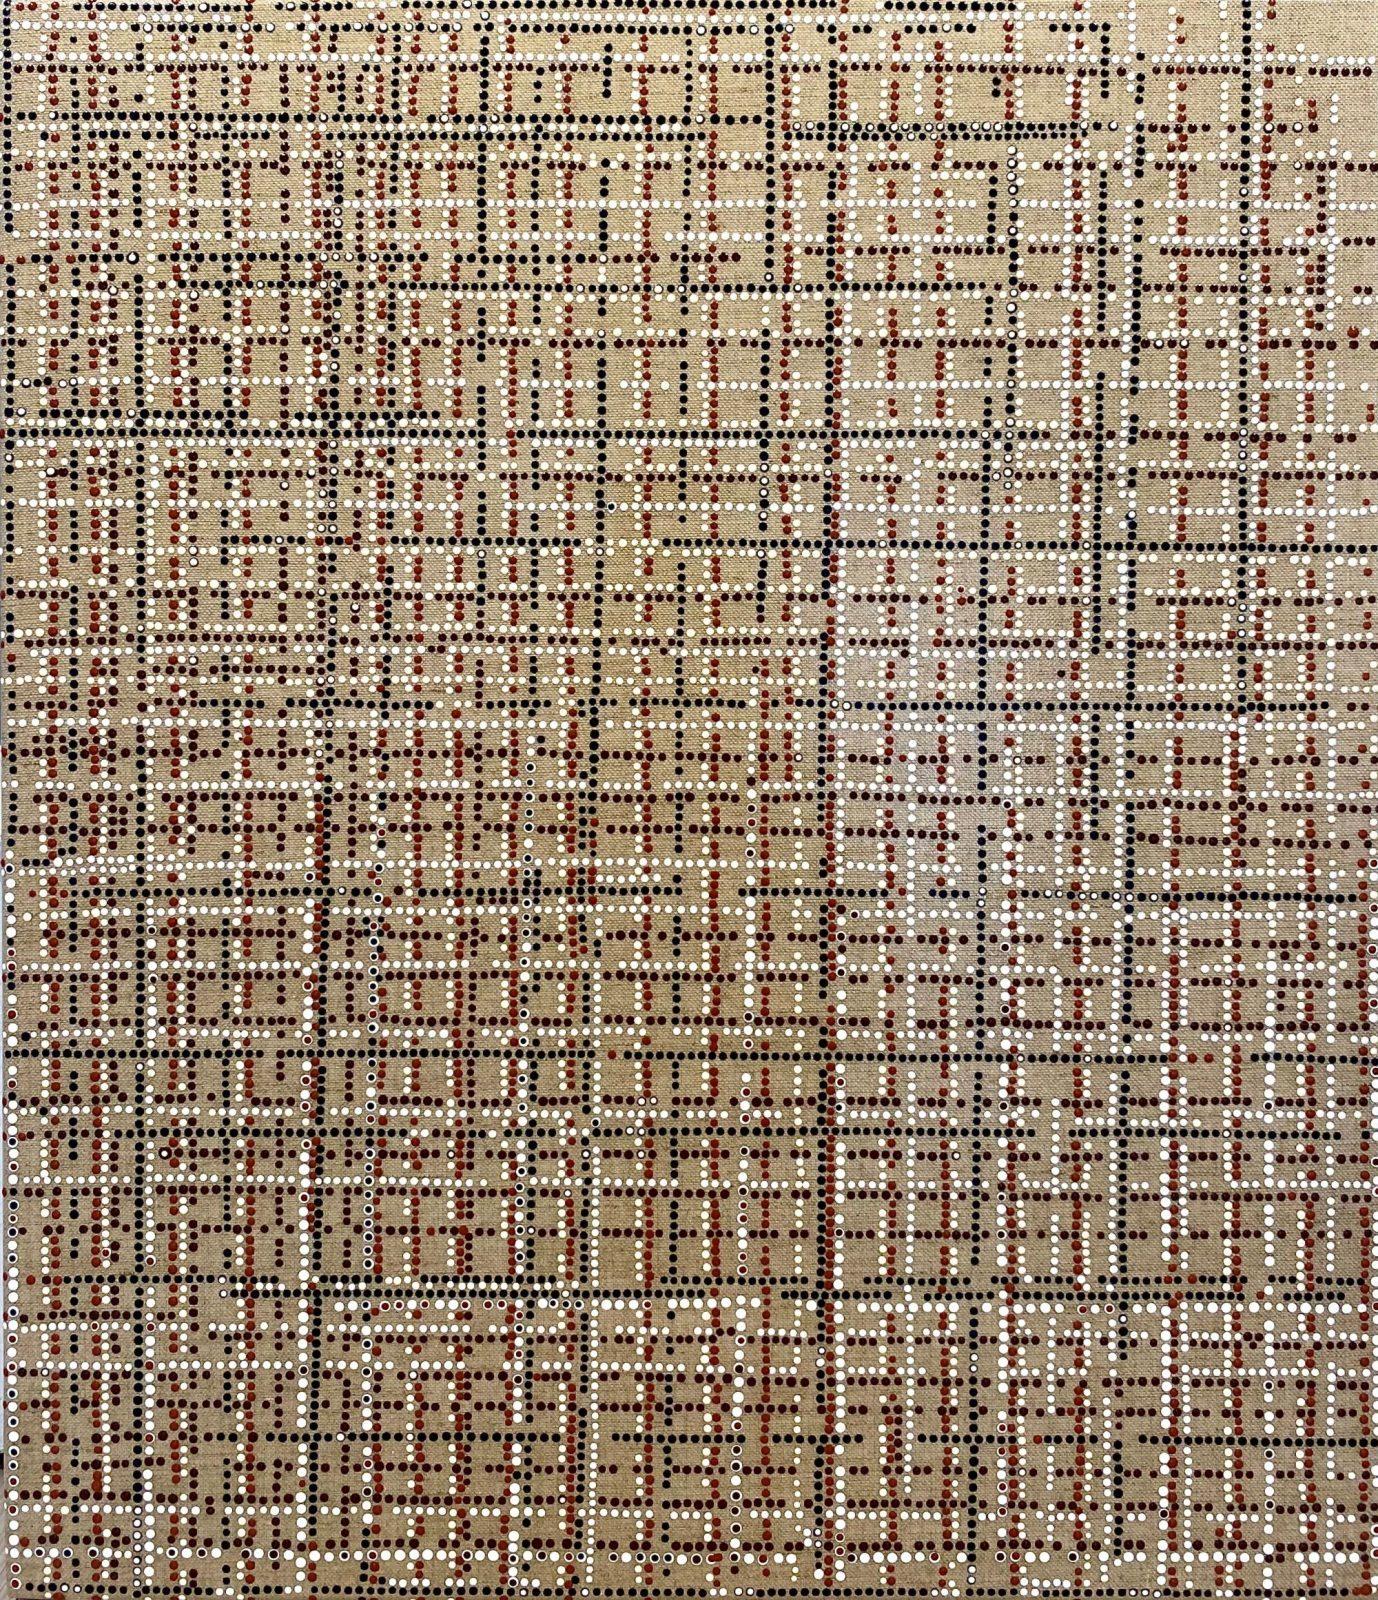 Keseru_Cn2104292_XXth century series_Piet Mondrian_Meets the Koories_Australian Aborginees